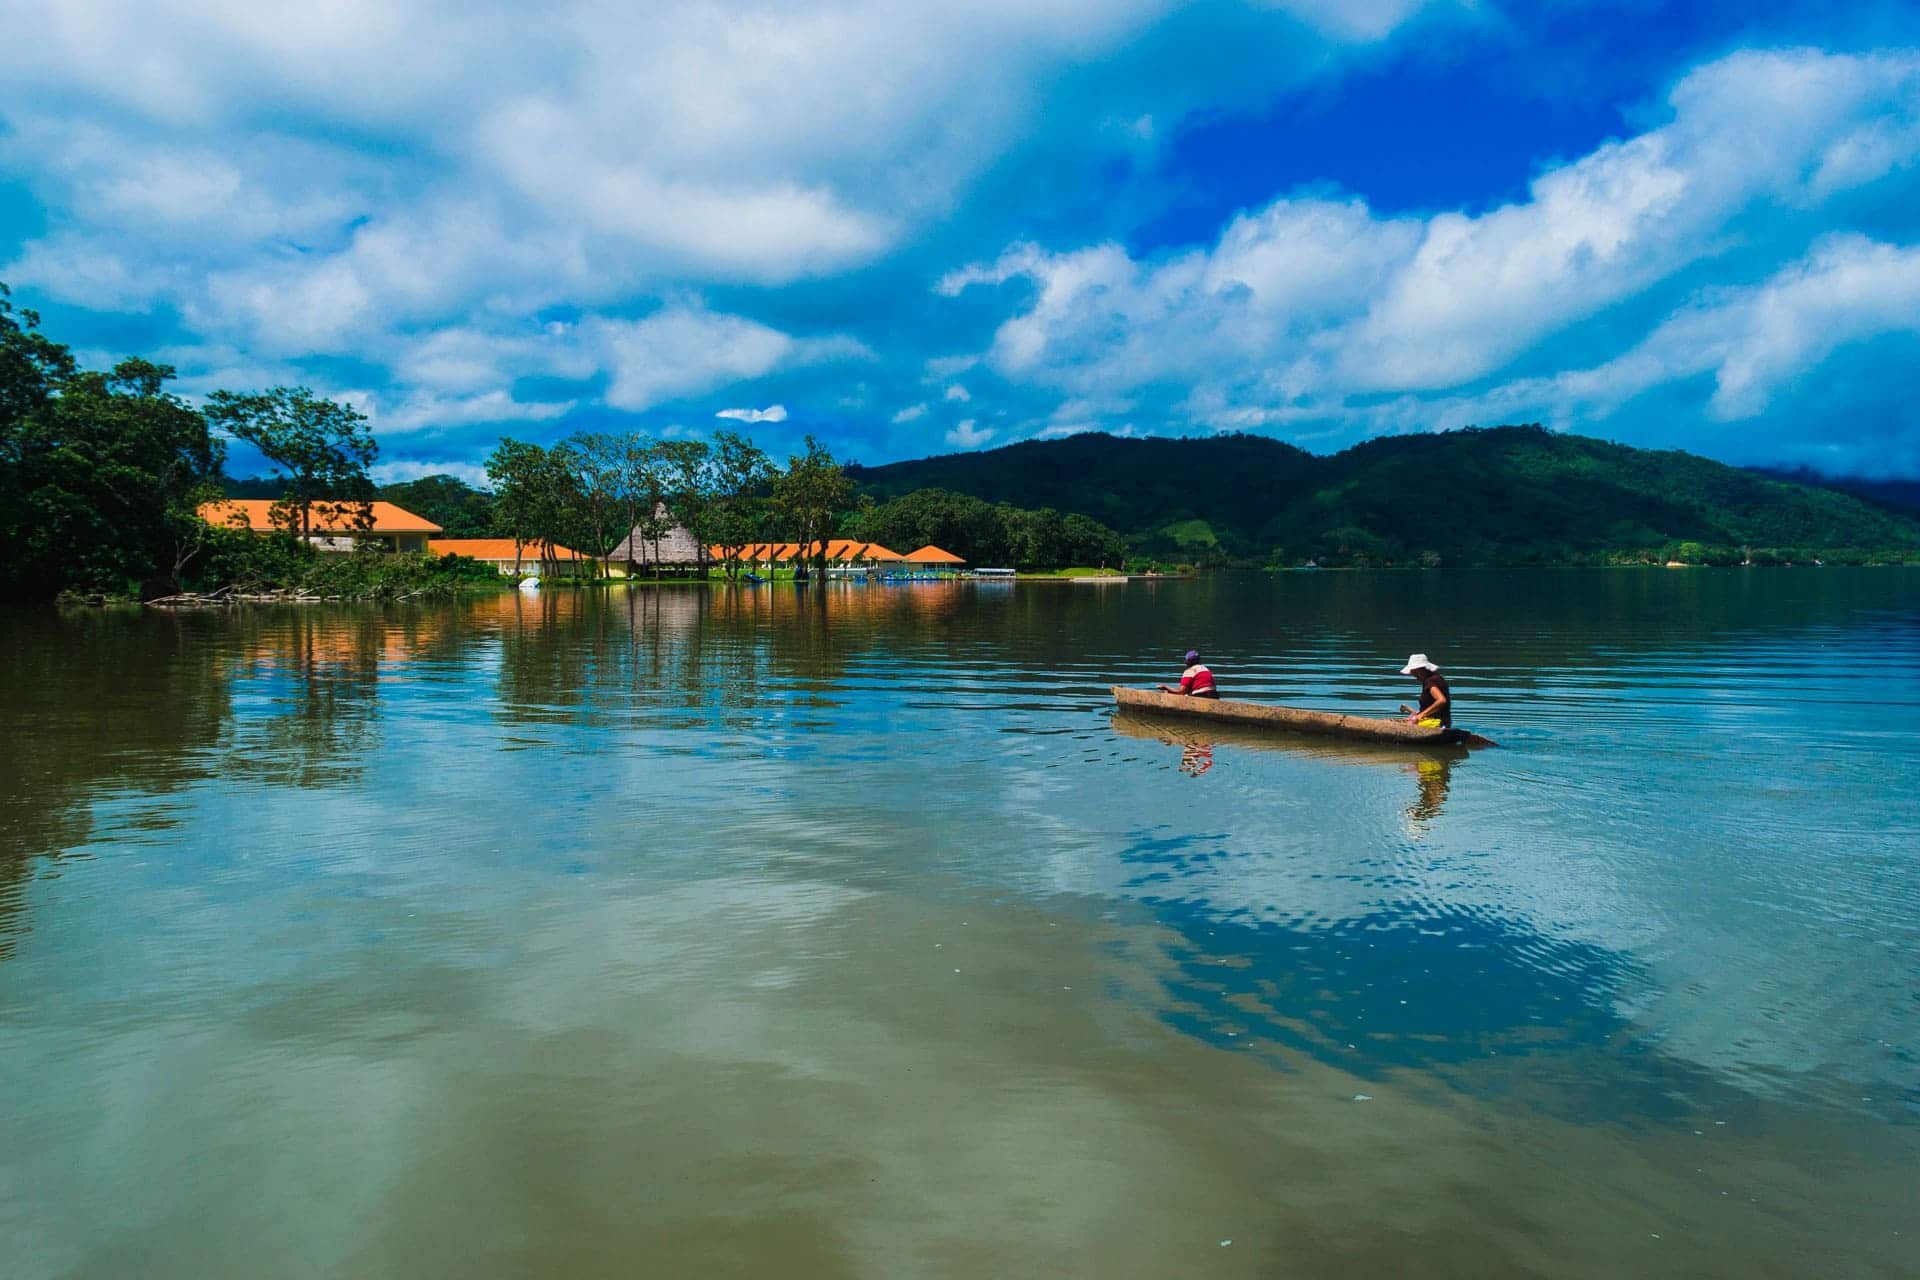 Vive cerca lugares turísticos de Tarapoto